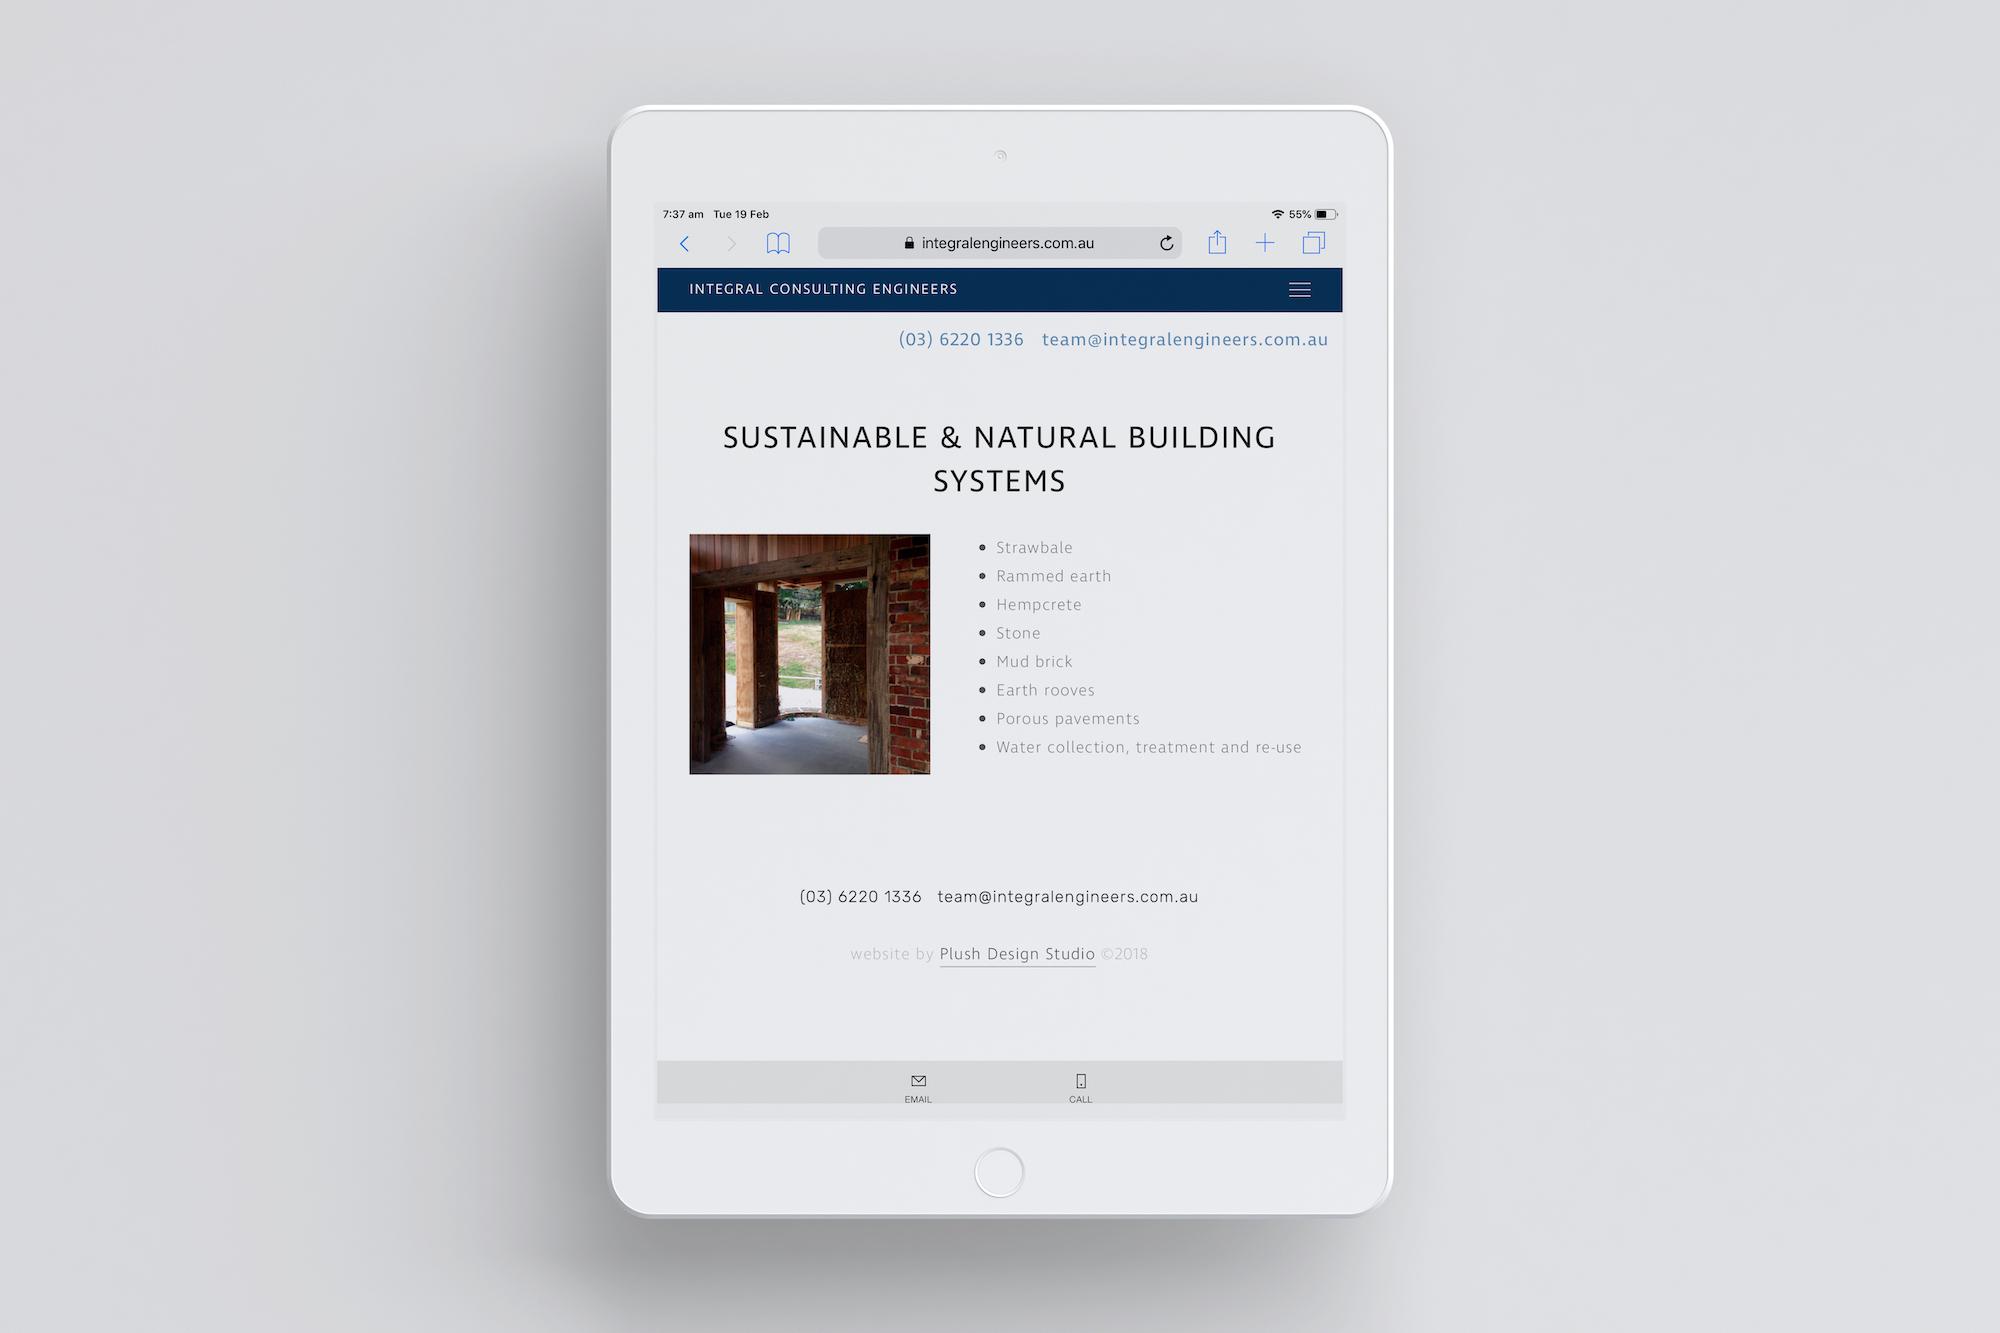 Website Design Coffs Harbour Integral services iPad Plush Design Studio Coffs Harbour.jpg